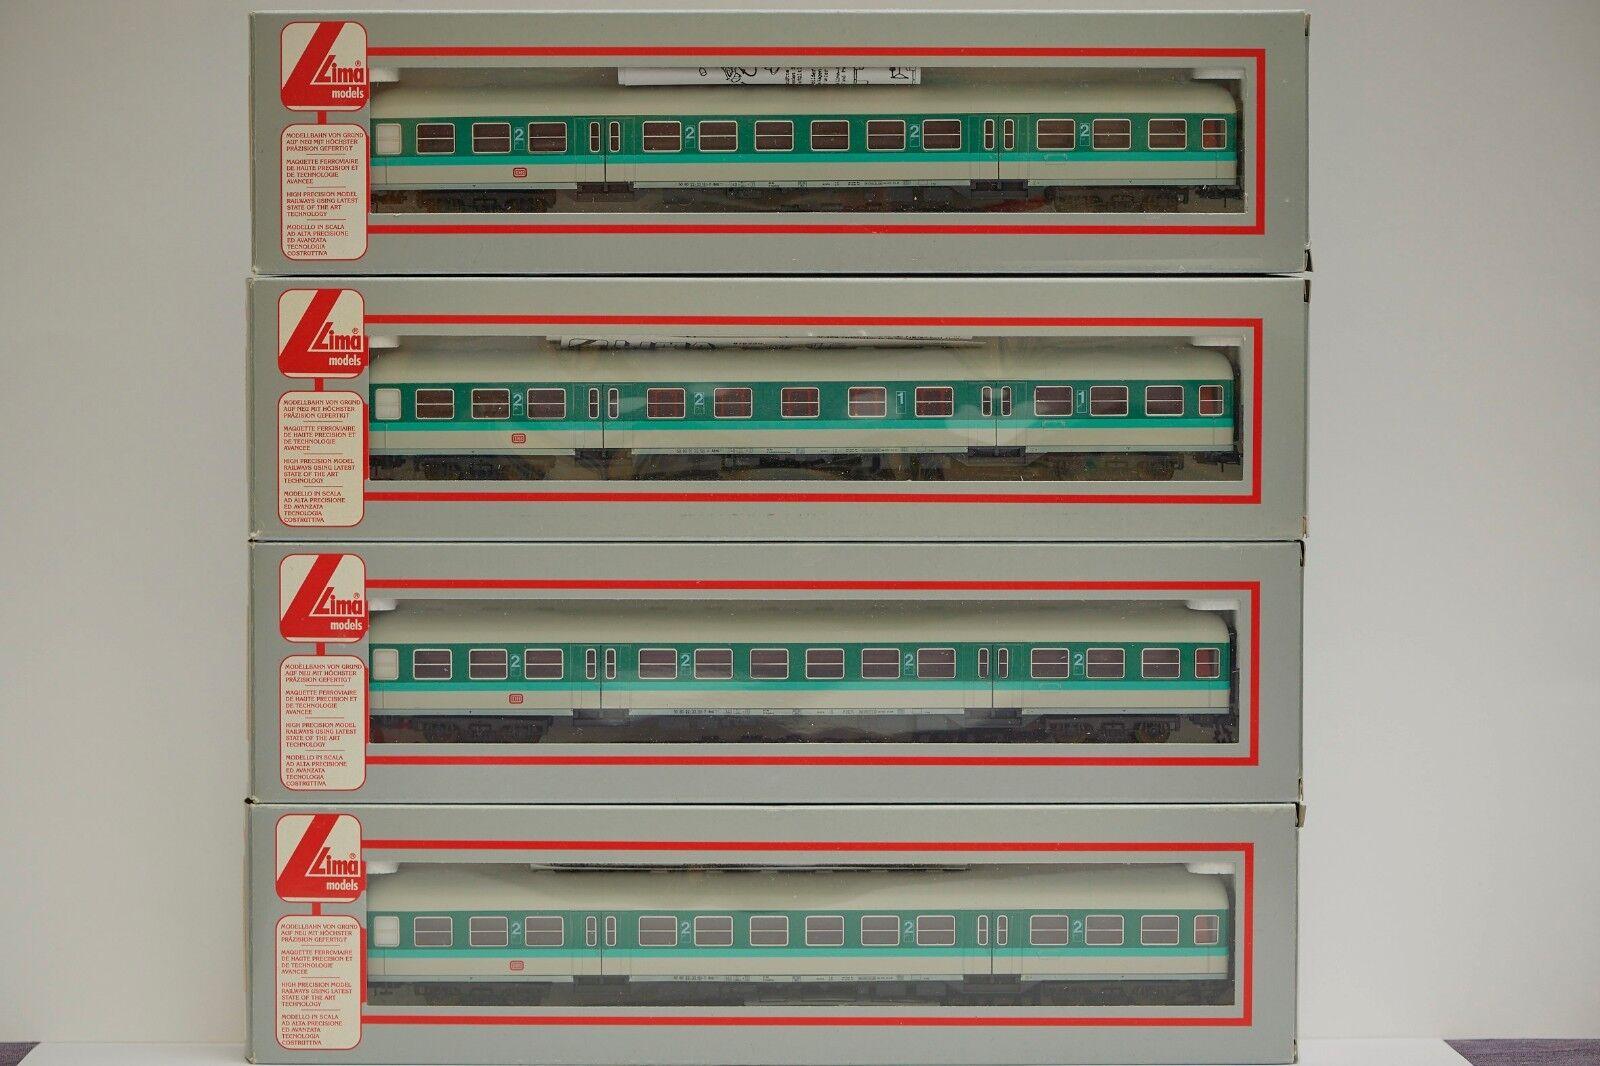 Lima Personenwagen 309637K 1.u.2.Kl., 309638K 2.Kl. 3x  | Exquisite Verarbeitung